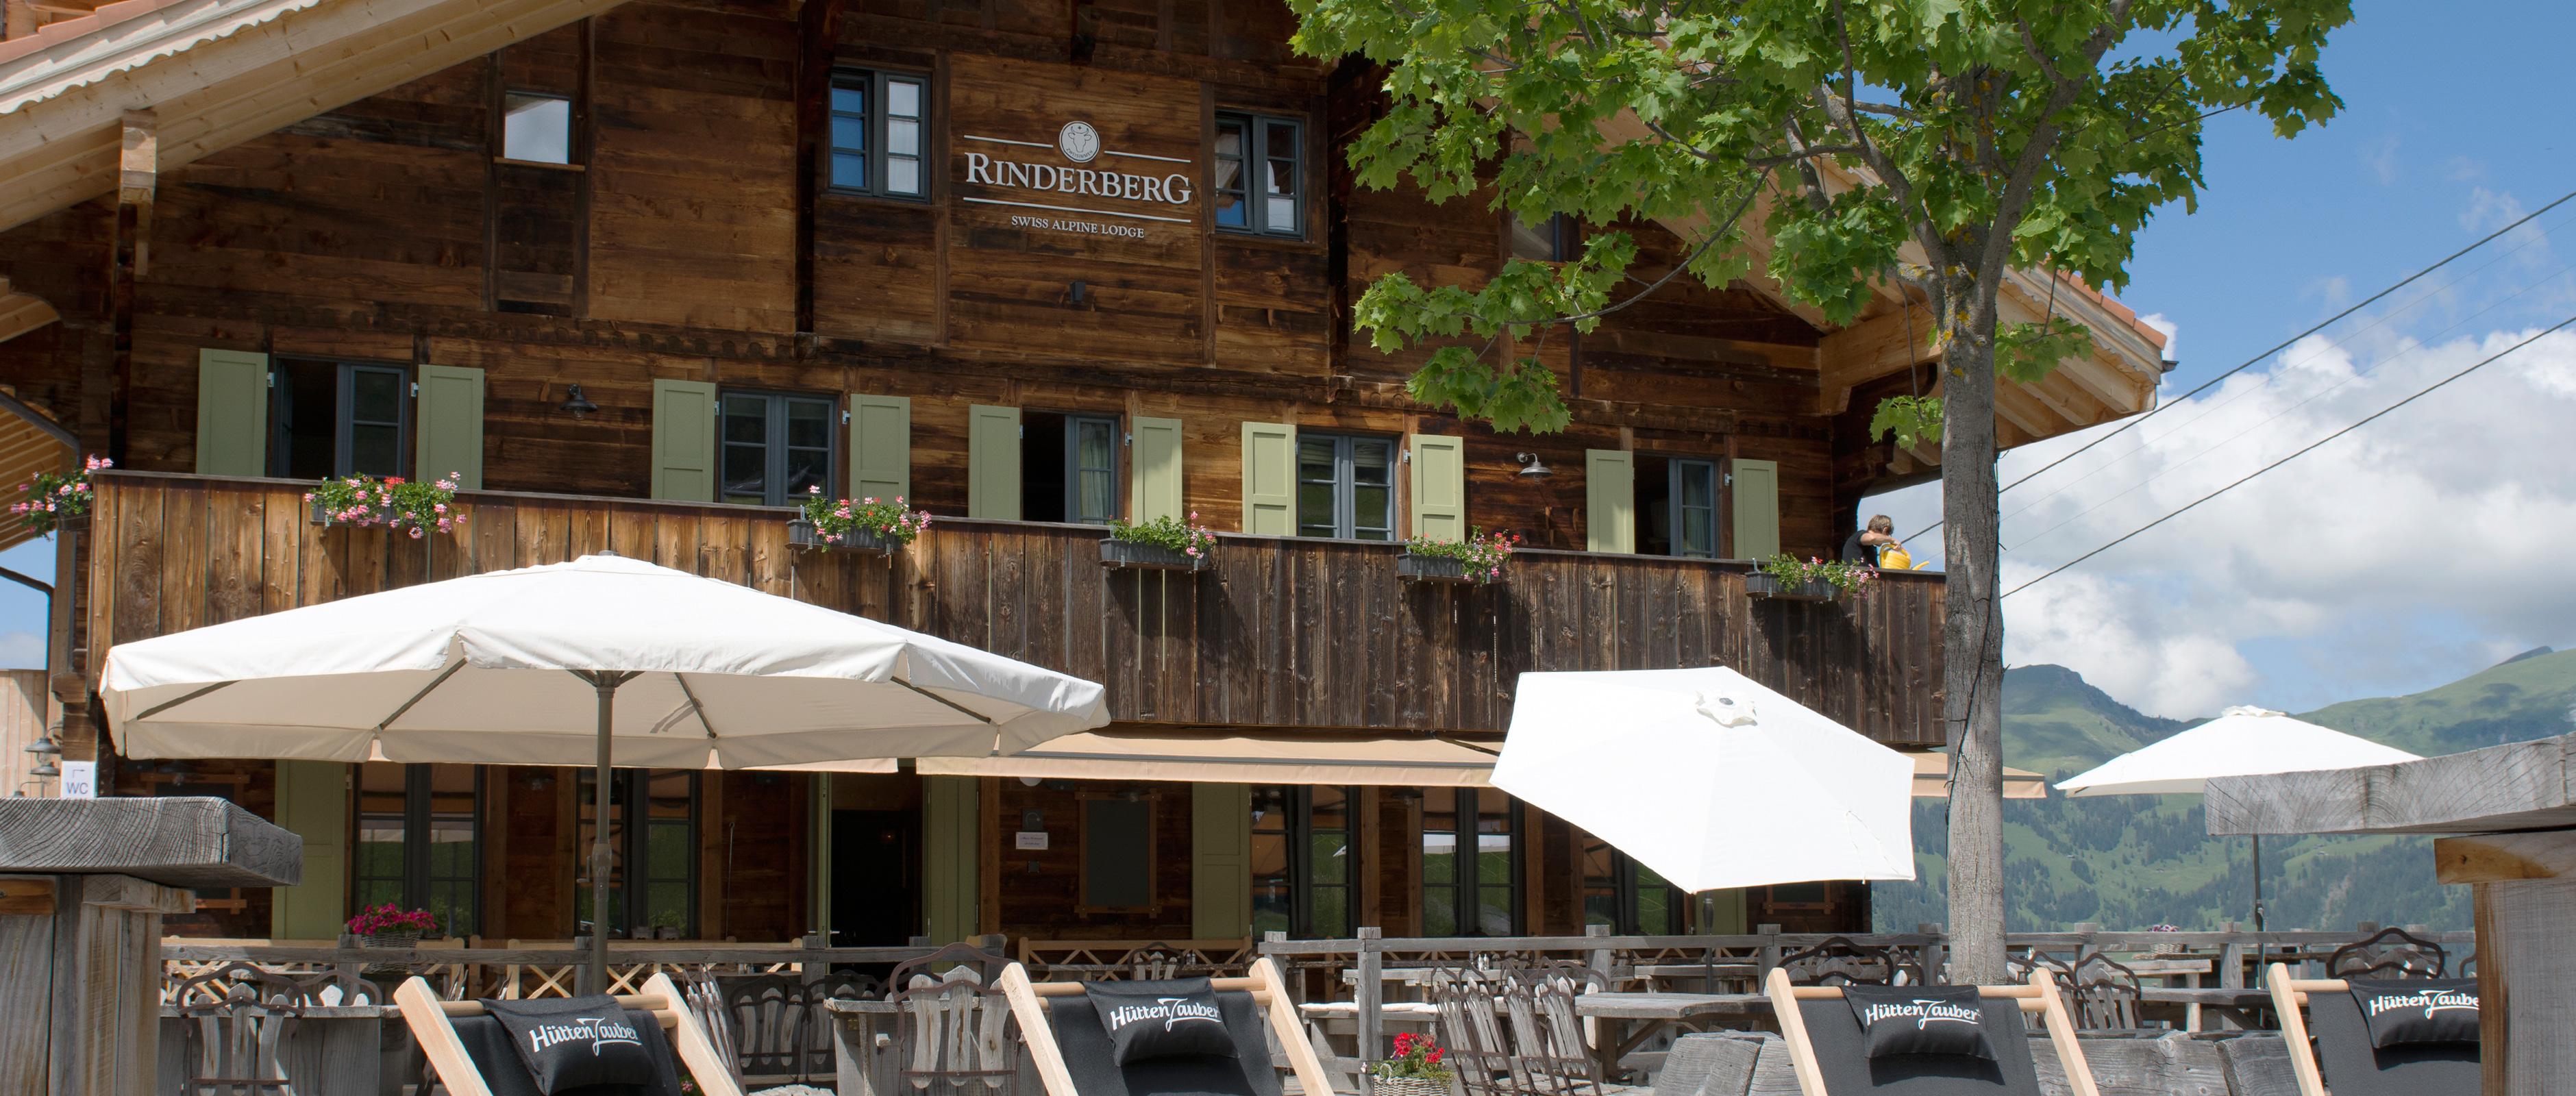 Gallery hotel rinderberg swiss alpine lodge en for Alpine lodge